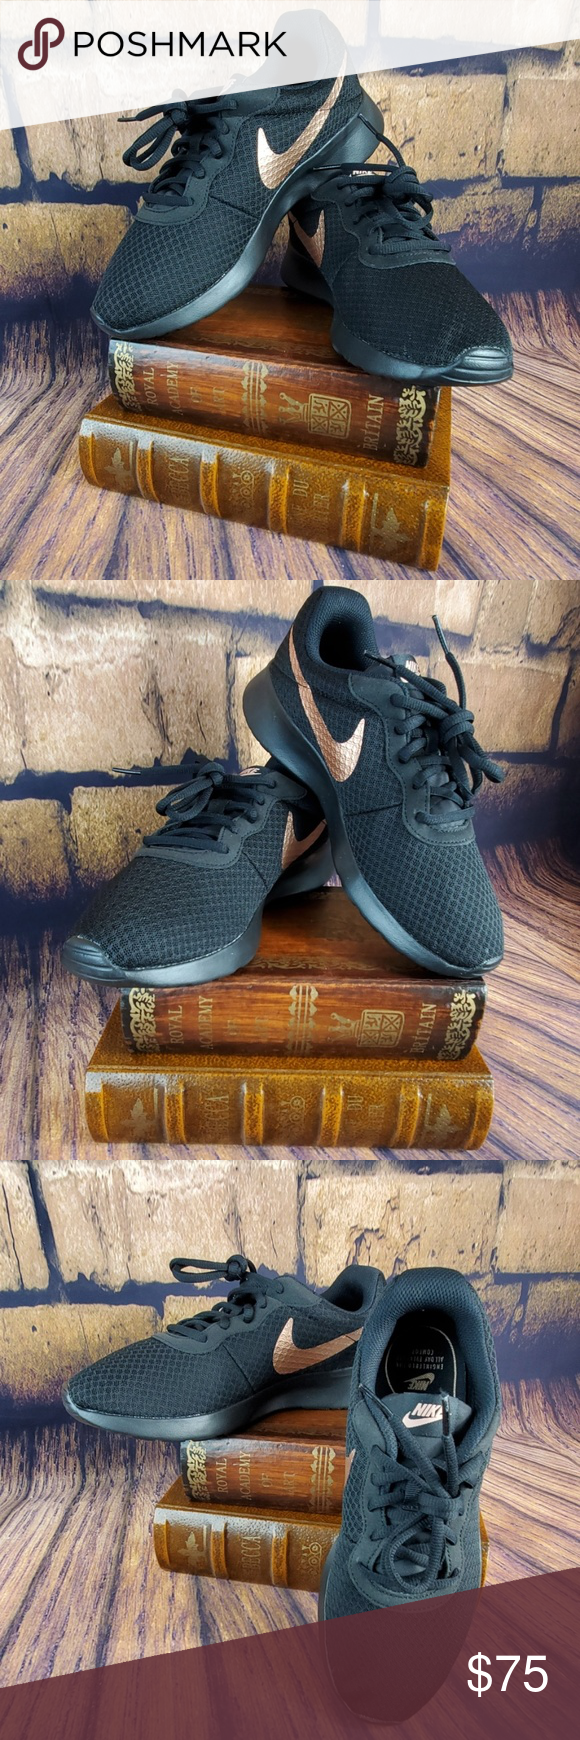 Nike Tanjun Black Metallic Red Bronze